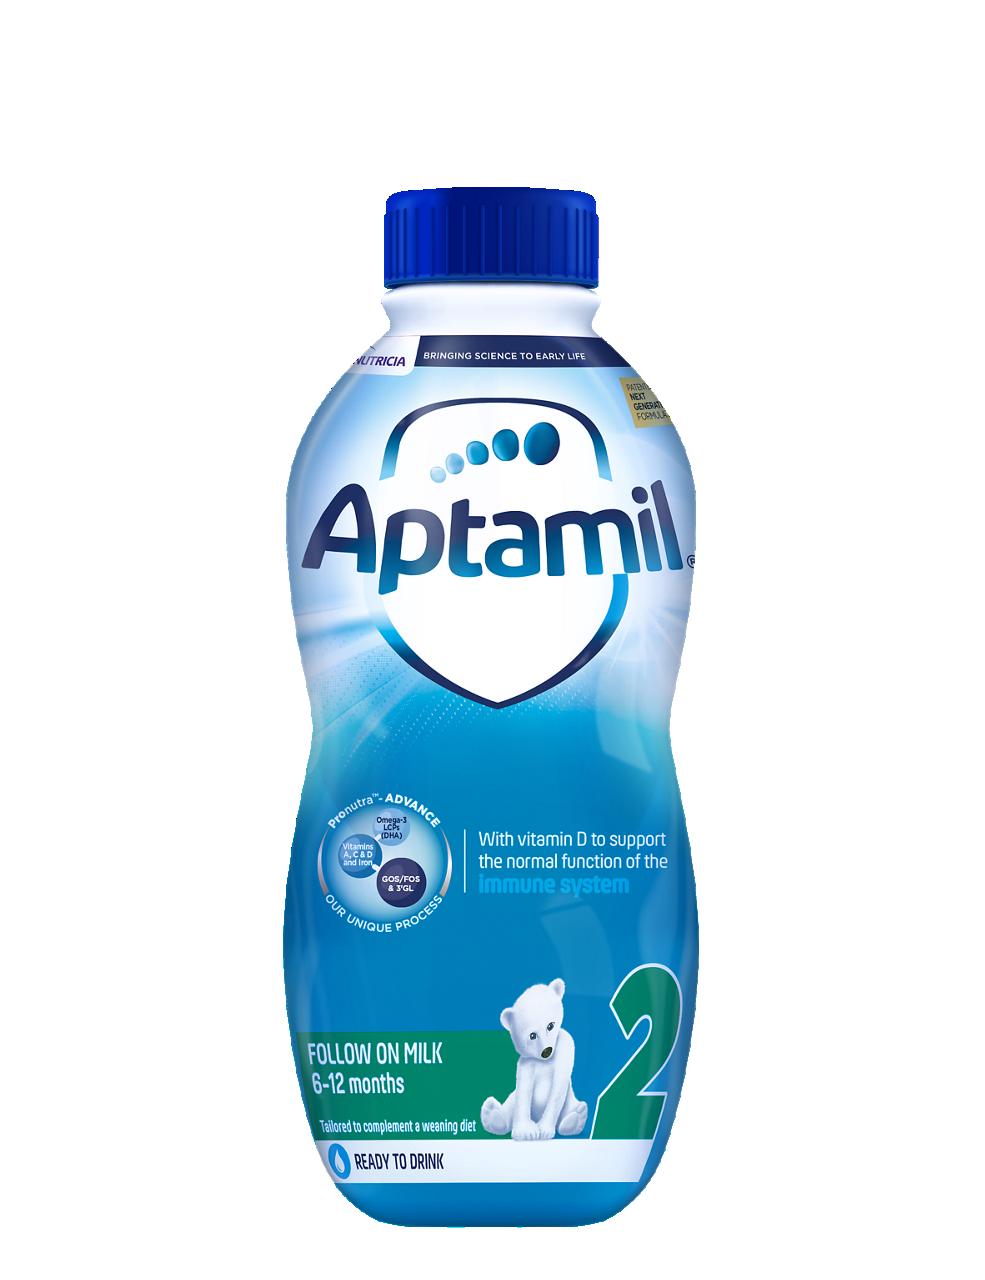 aptami-fom-1ltr-front.png